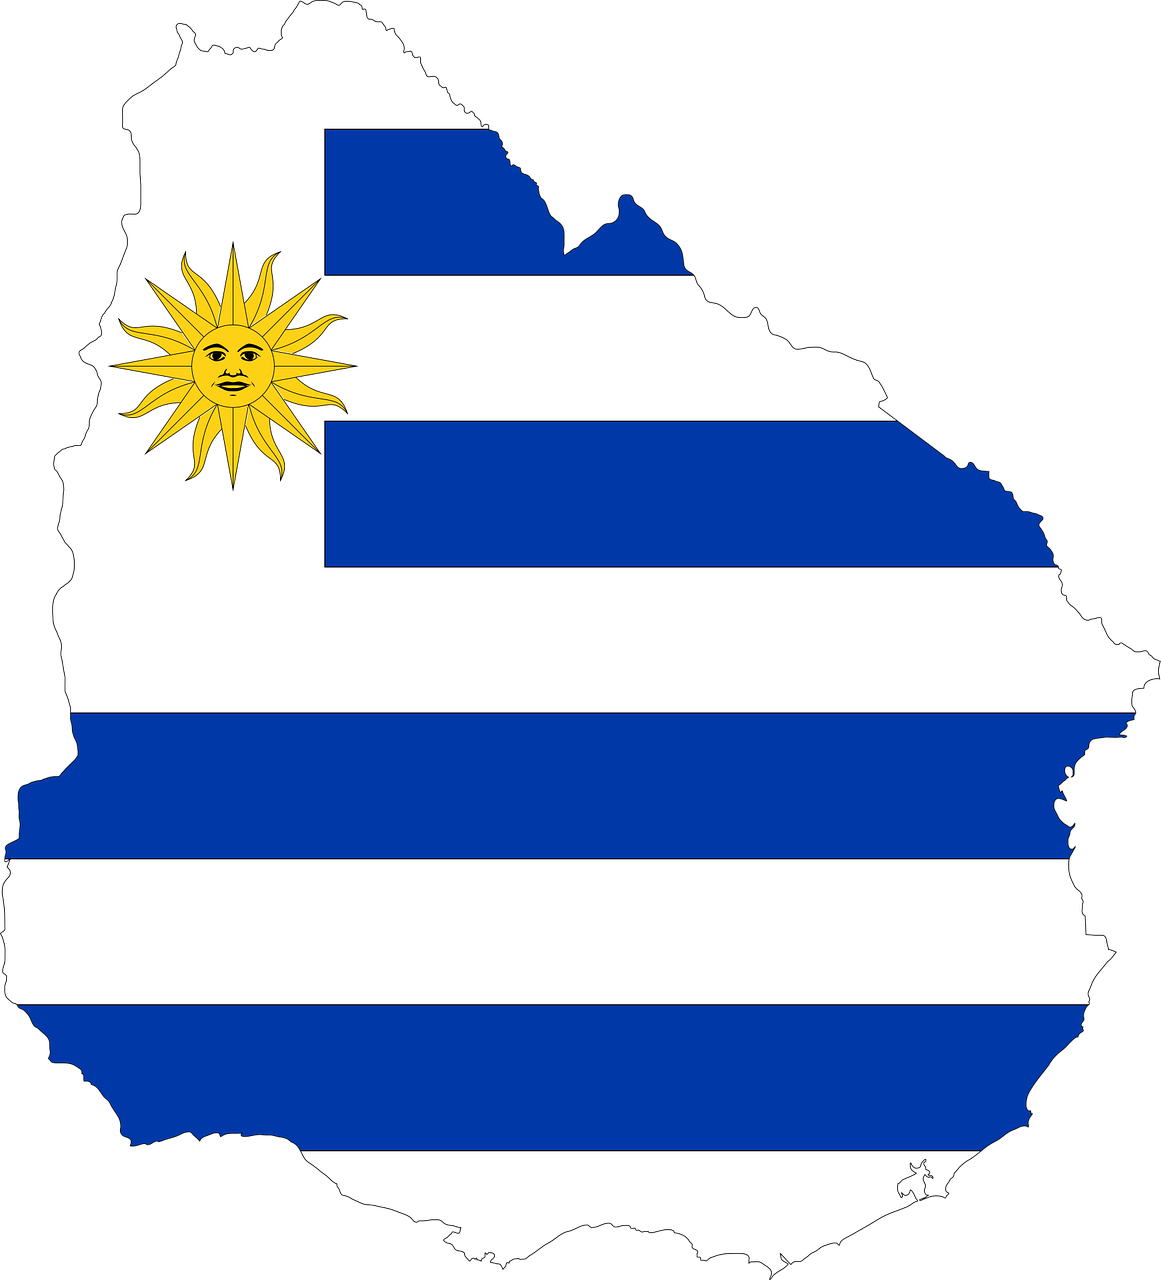 Erzähl mir was: Uruguay